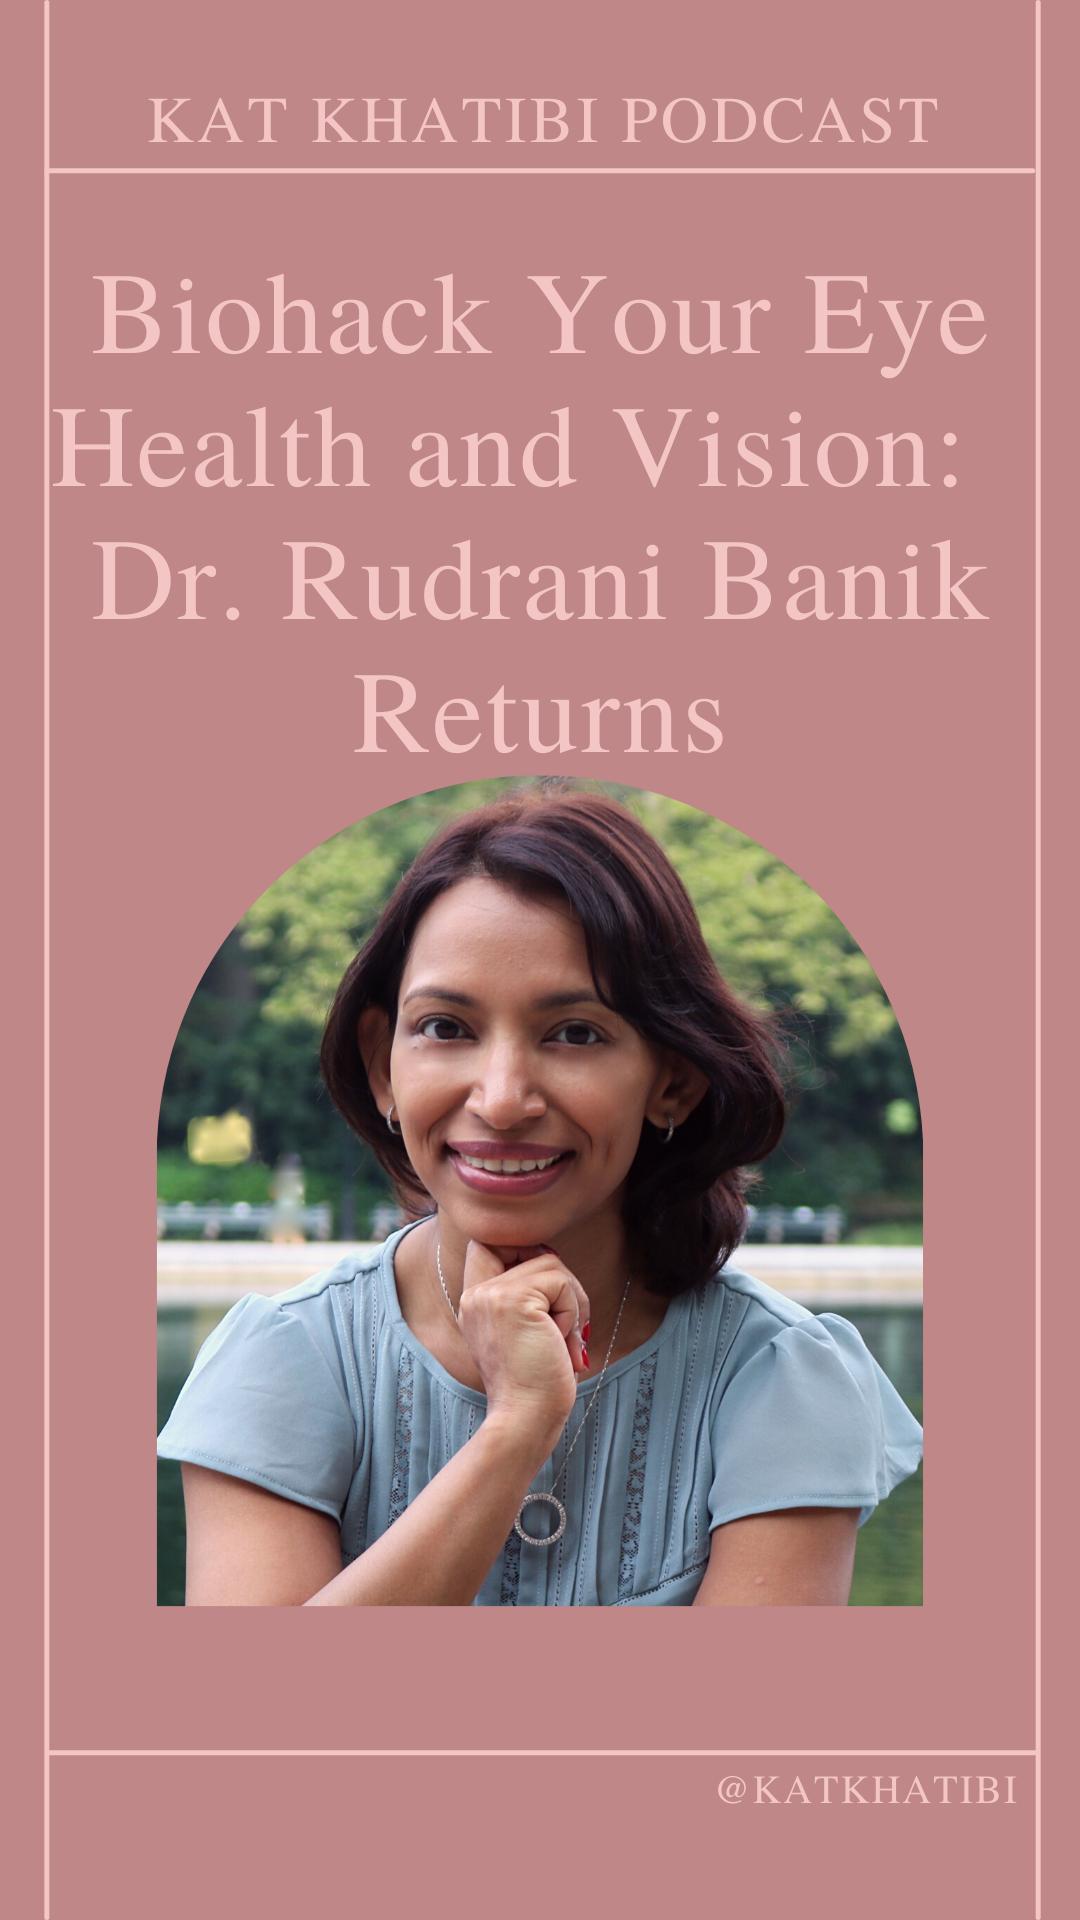 Biohack Your Eye Health and Vision: Dr. Rudrani Banik Returns